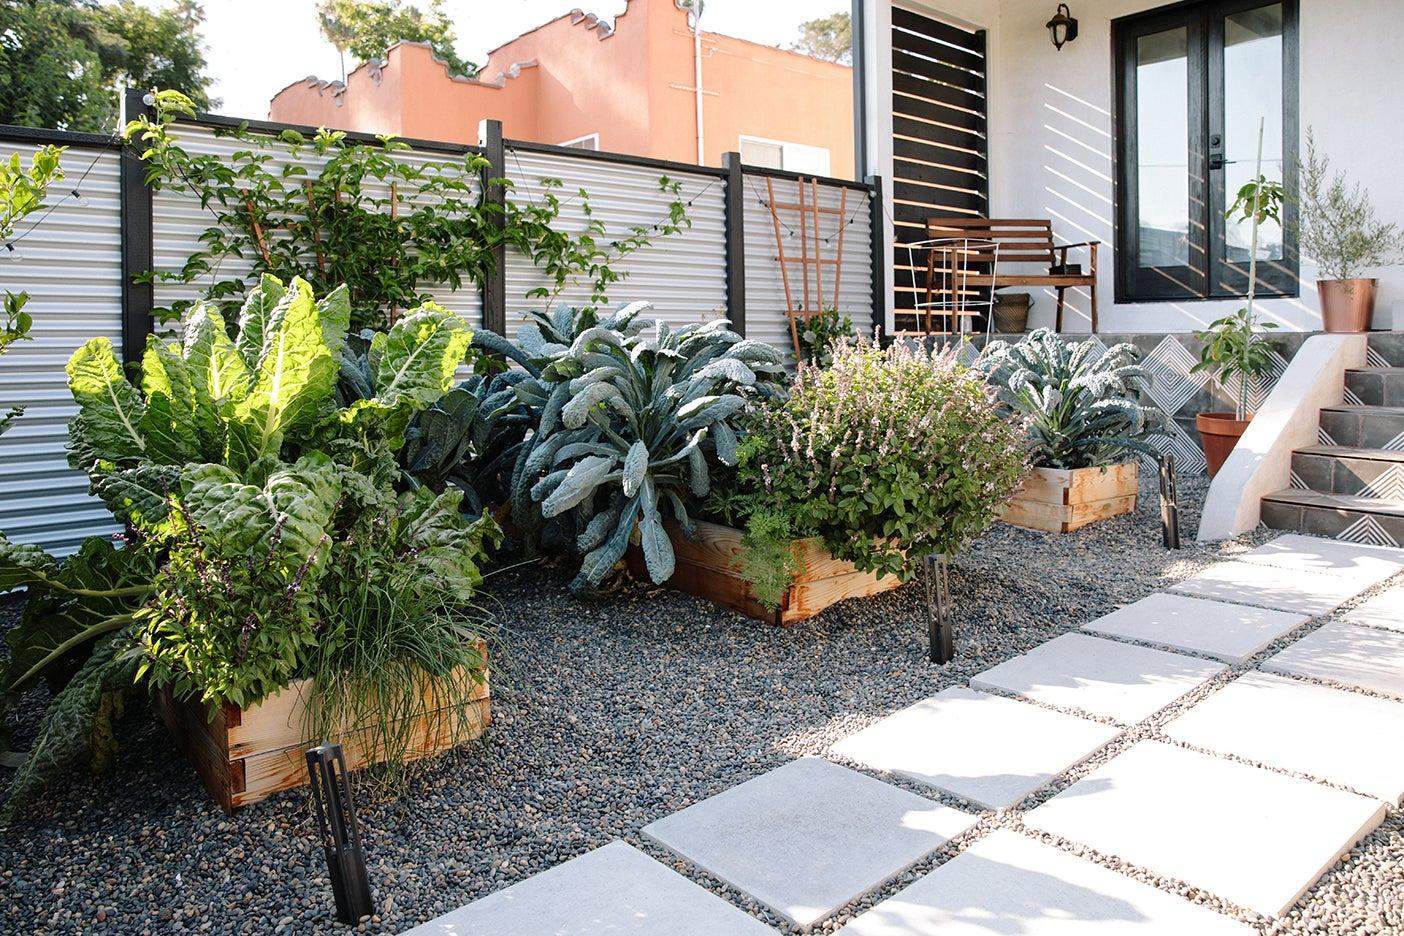 veggies in planter boxes